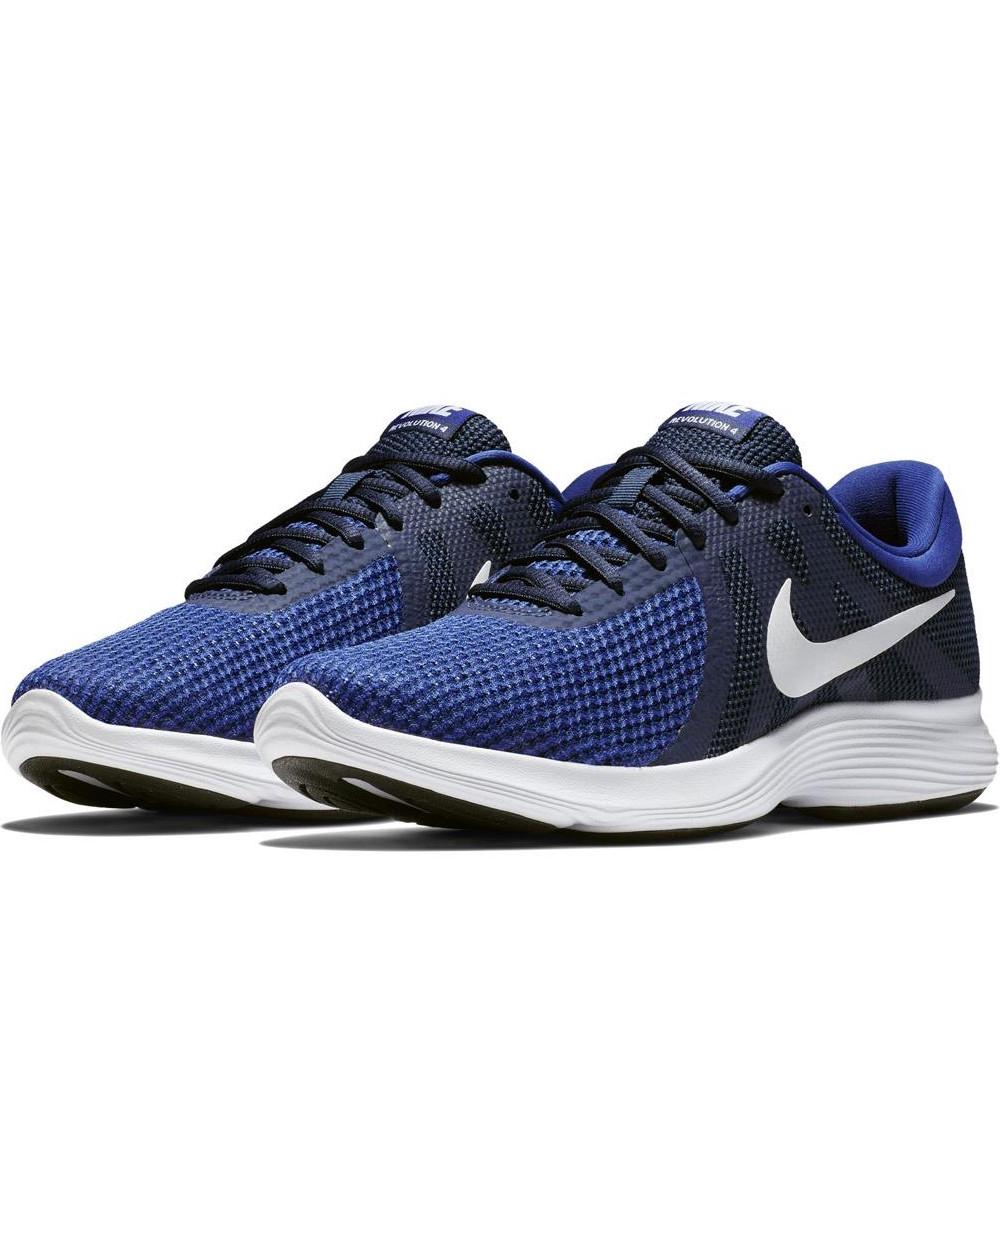 Ginnastica Palestra Sneakers Scarpe Revolution Running Jogging Nike Hgxaq